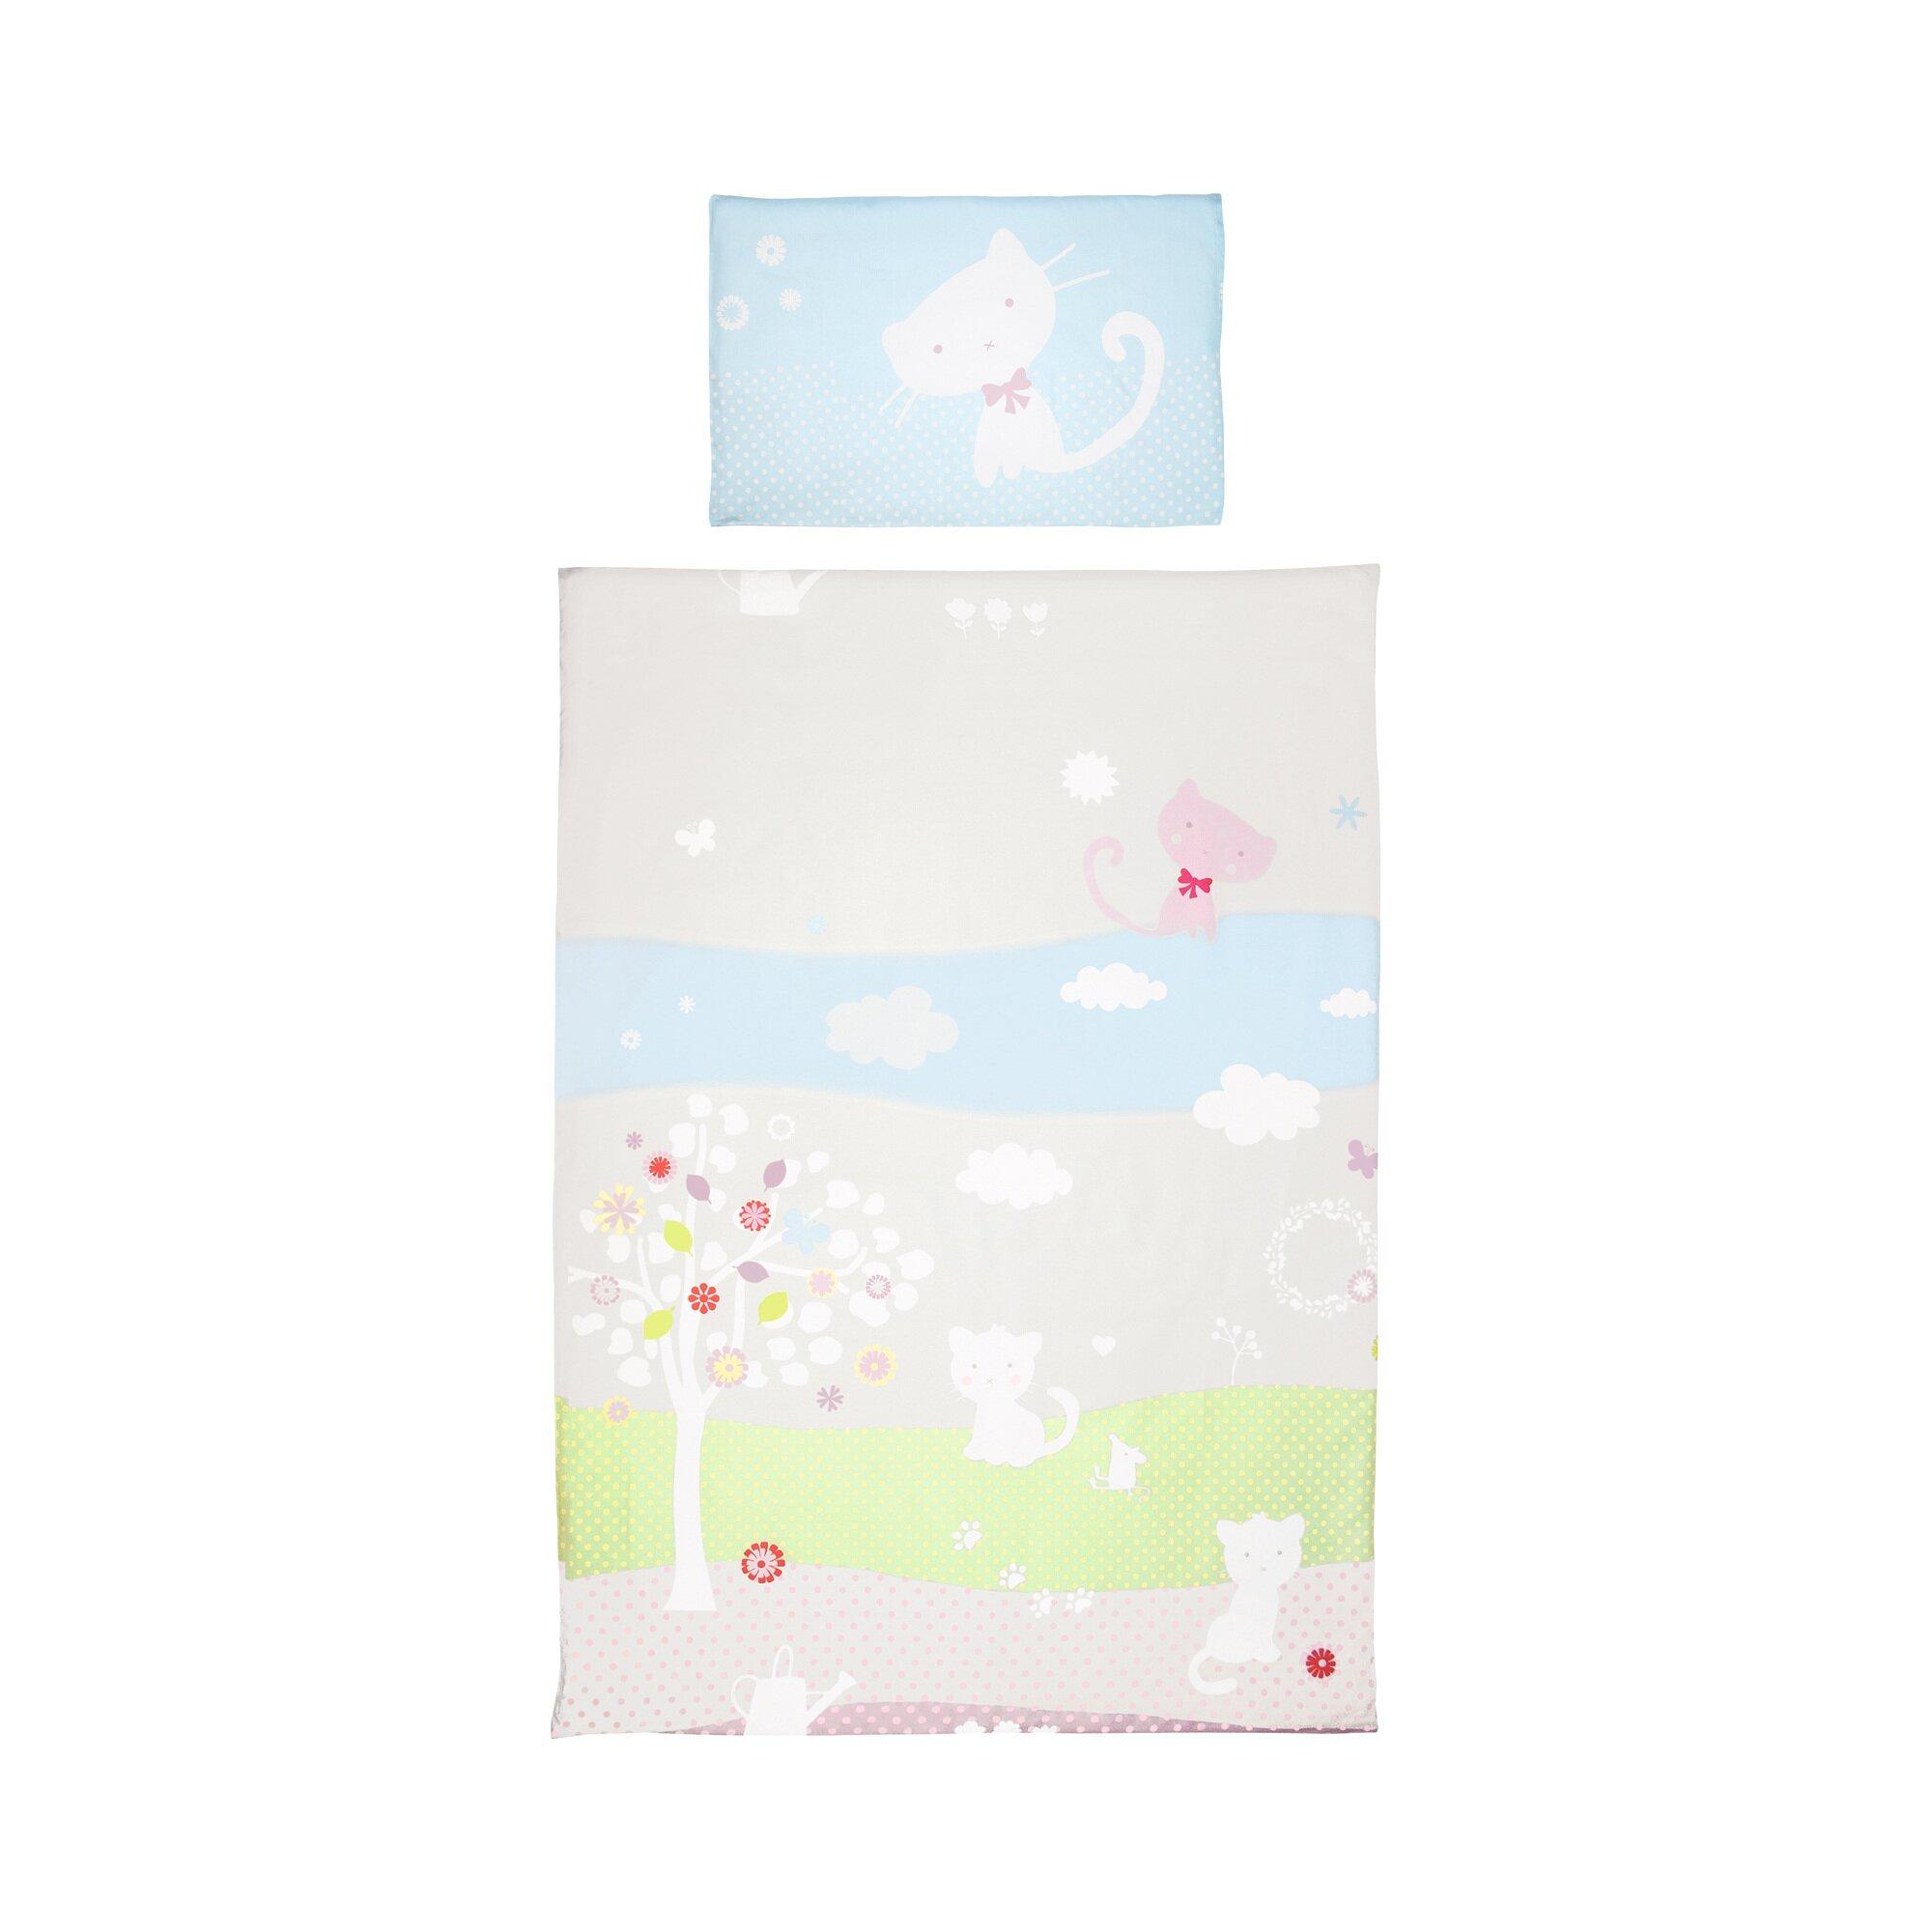 Bebella Vital Bettwäsche Tencel® Little Cats 40x60 / 100x135 cm mehrfarbig